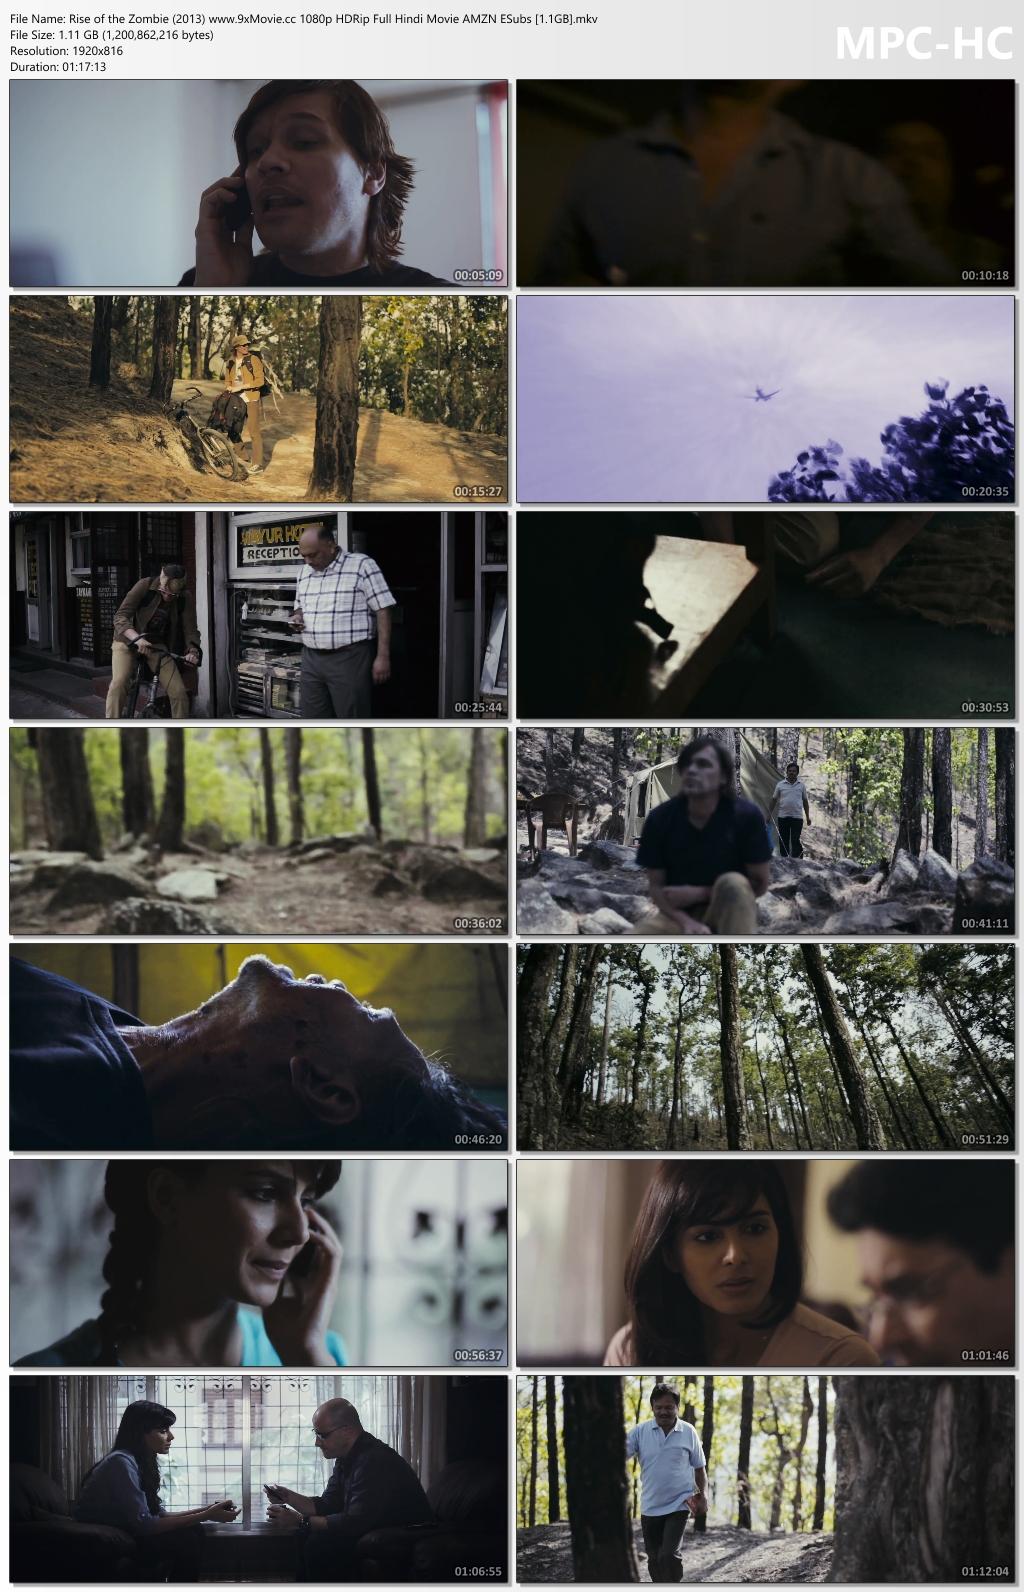 Rise-of-the-Zombie-2013-www-9x-Movie-cc-1080p-HDRip-Full-Hindi-Movie-AMZN-ESubs-1-1-GB-mkv